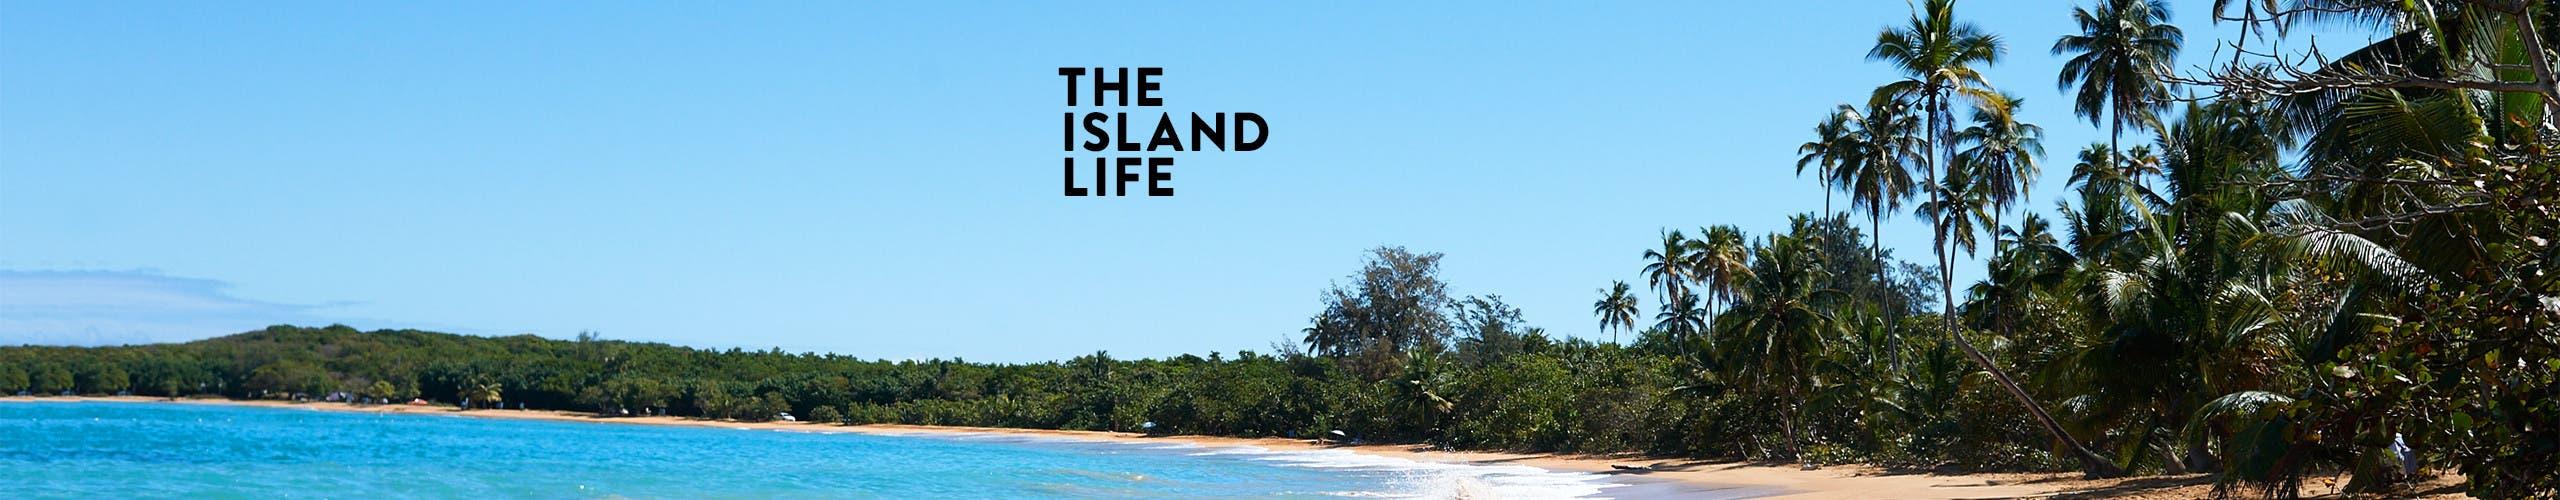 The island life: vacation essentials.